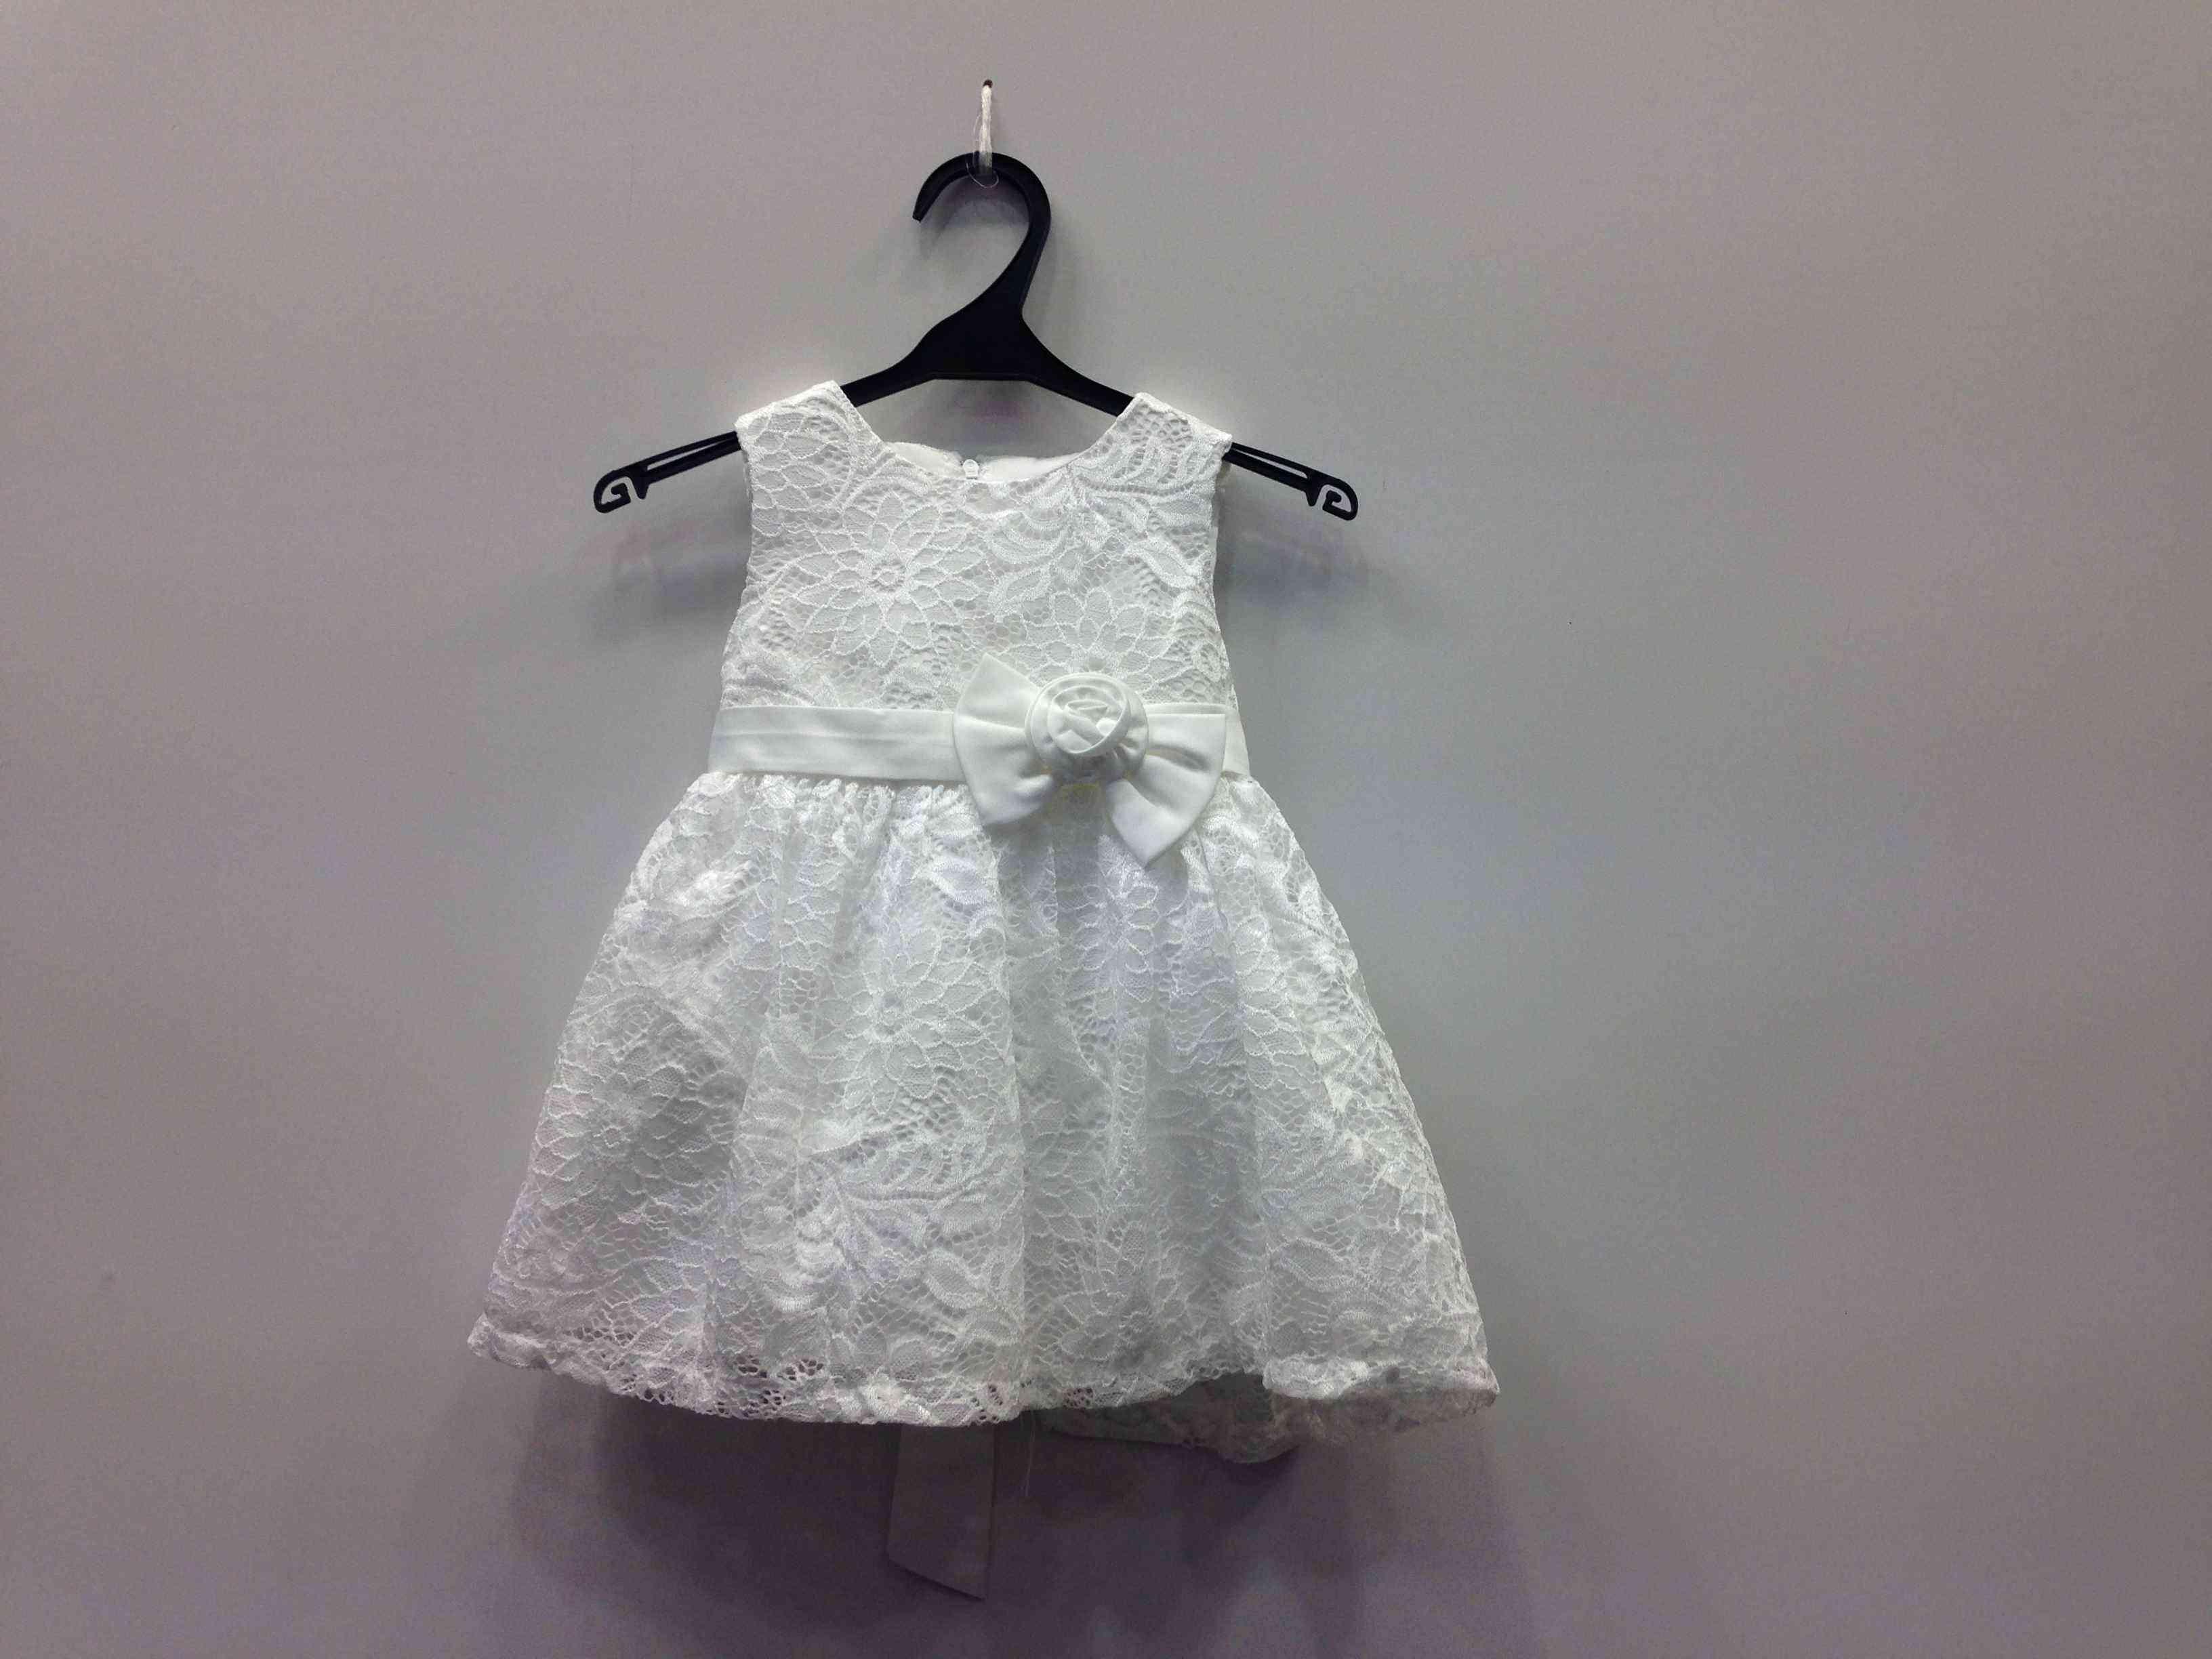 49dba177673 Φόρεμα δαντέλα με τριαντάφυλλο σε 2 χρώματα -